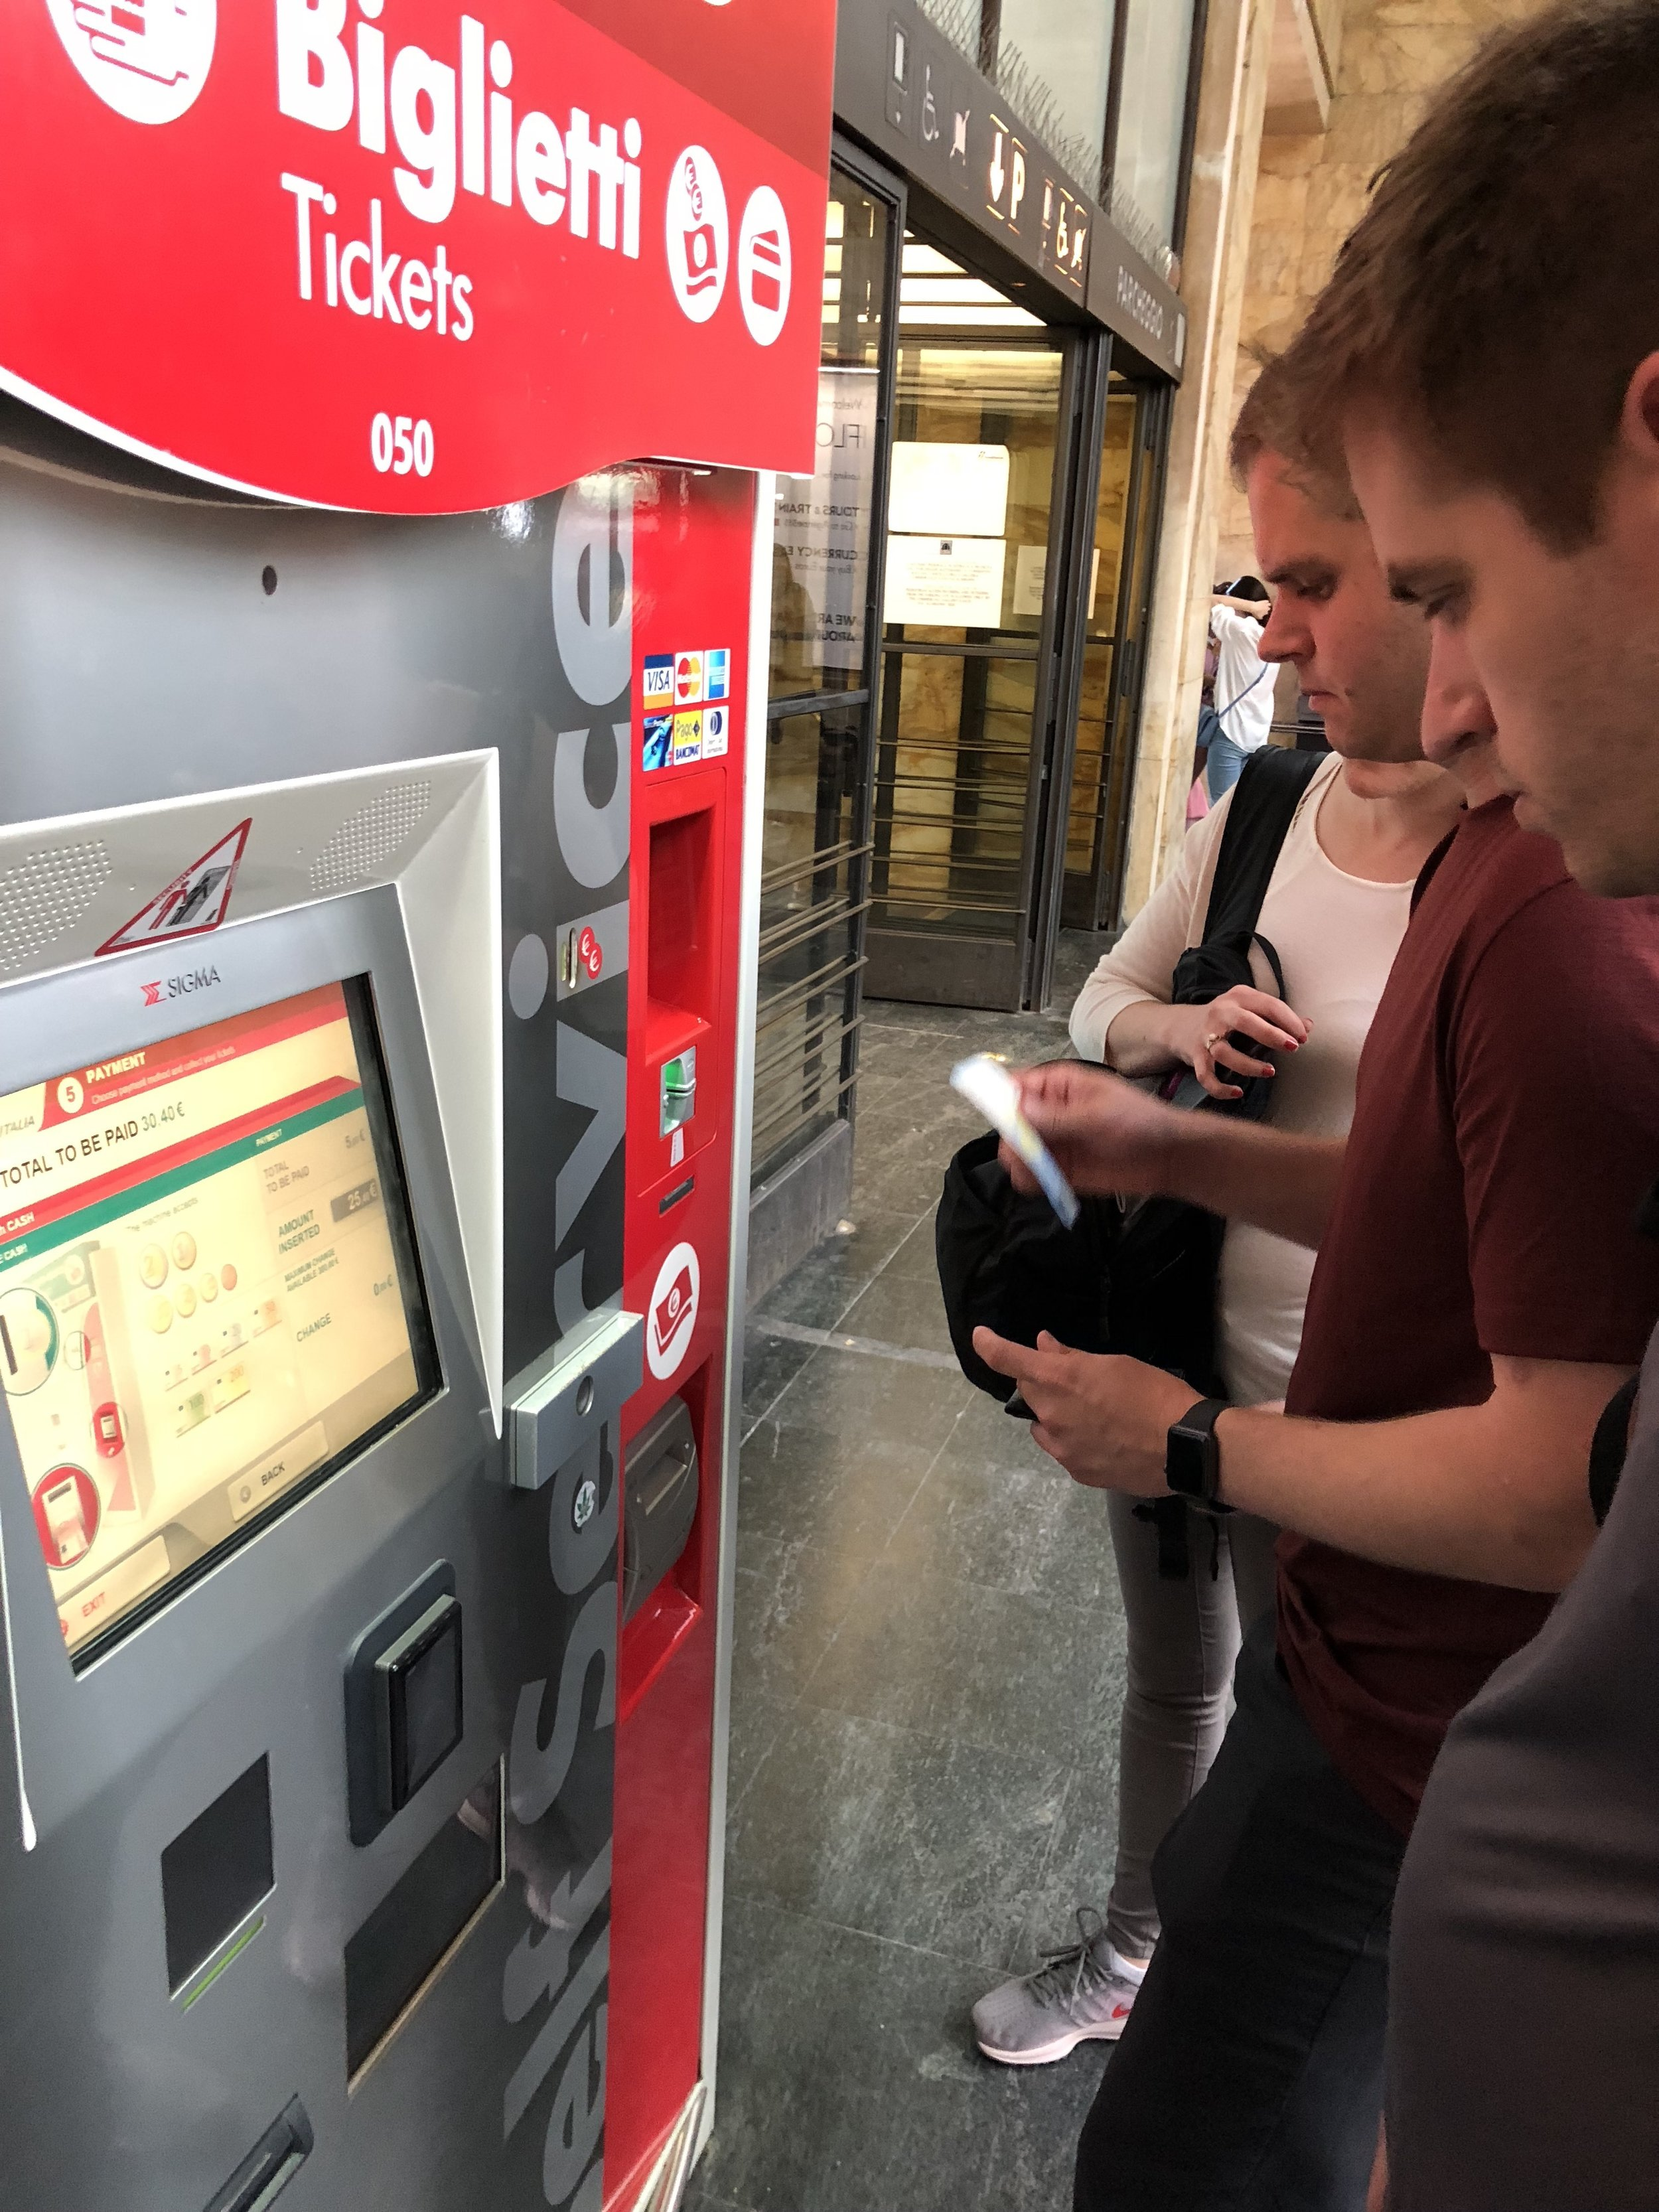 Self-service ticket kiosk at Florence SMN train station